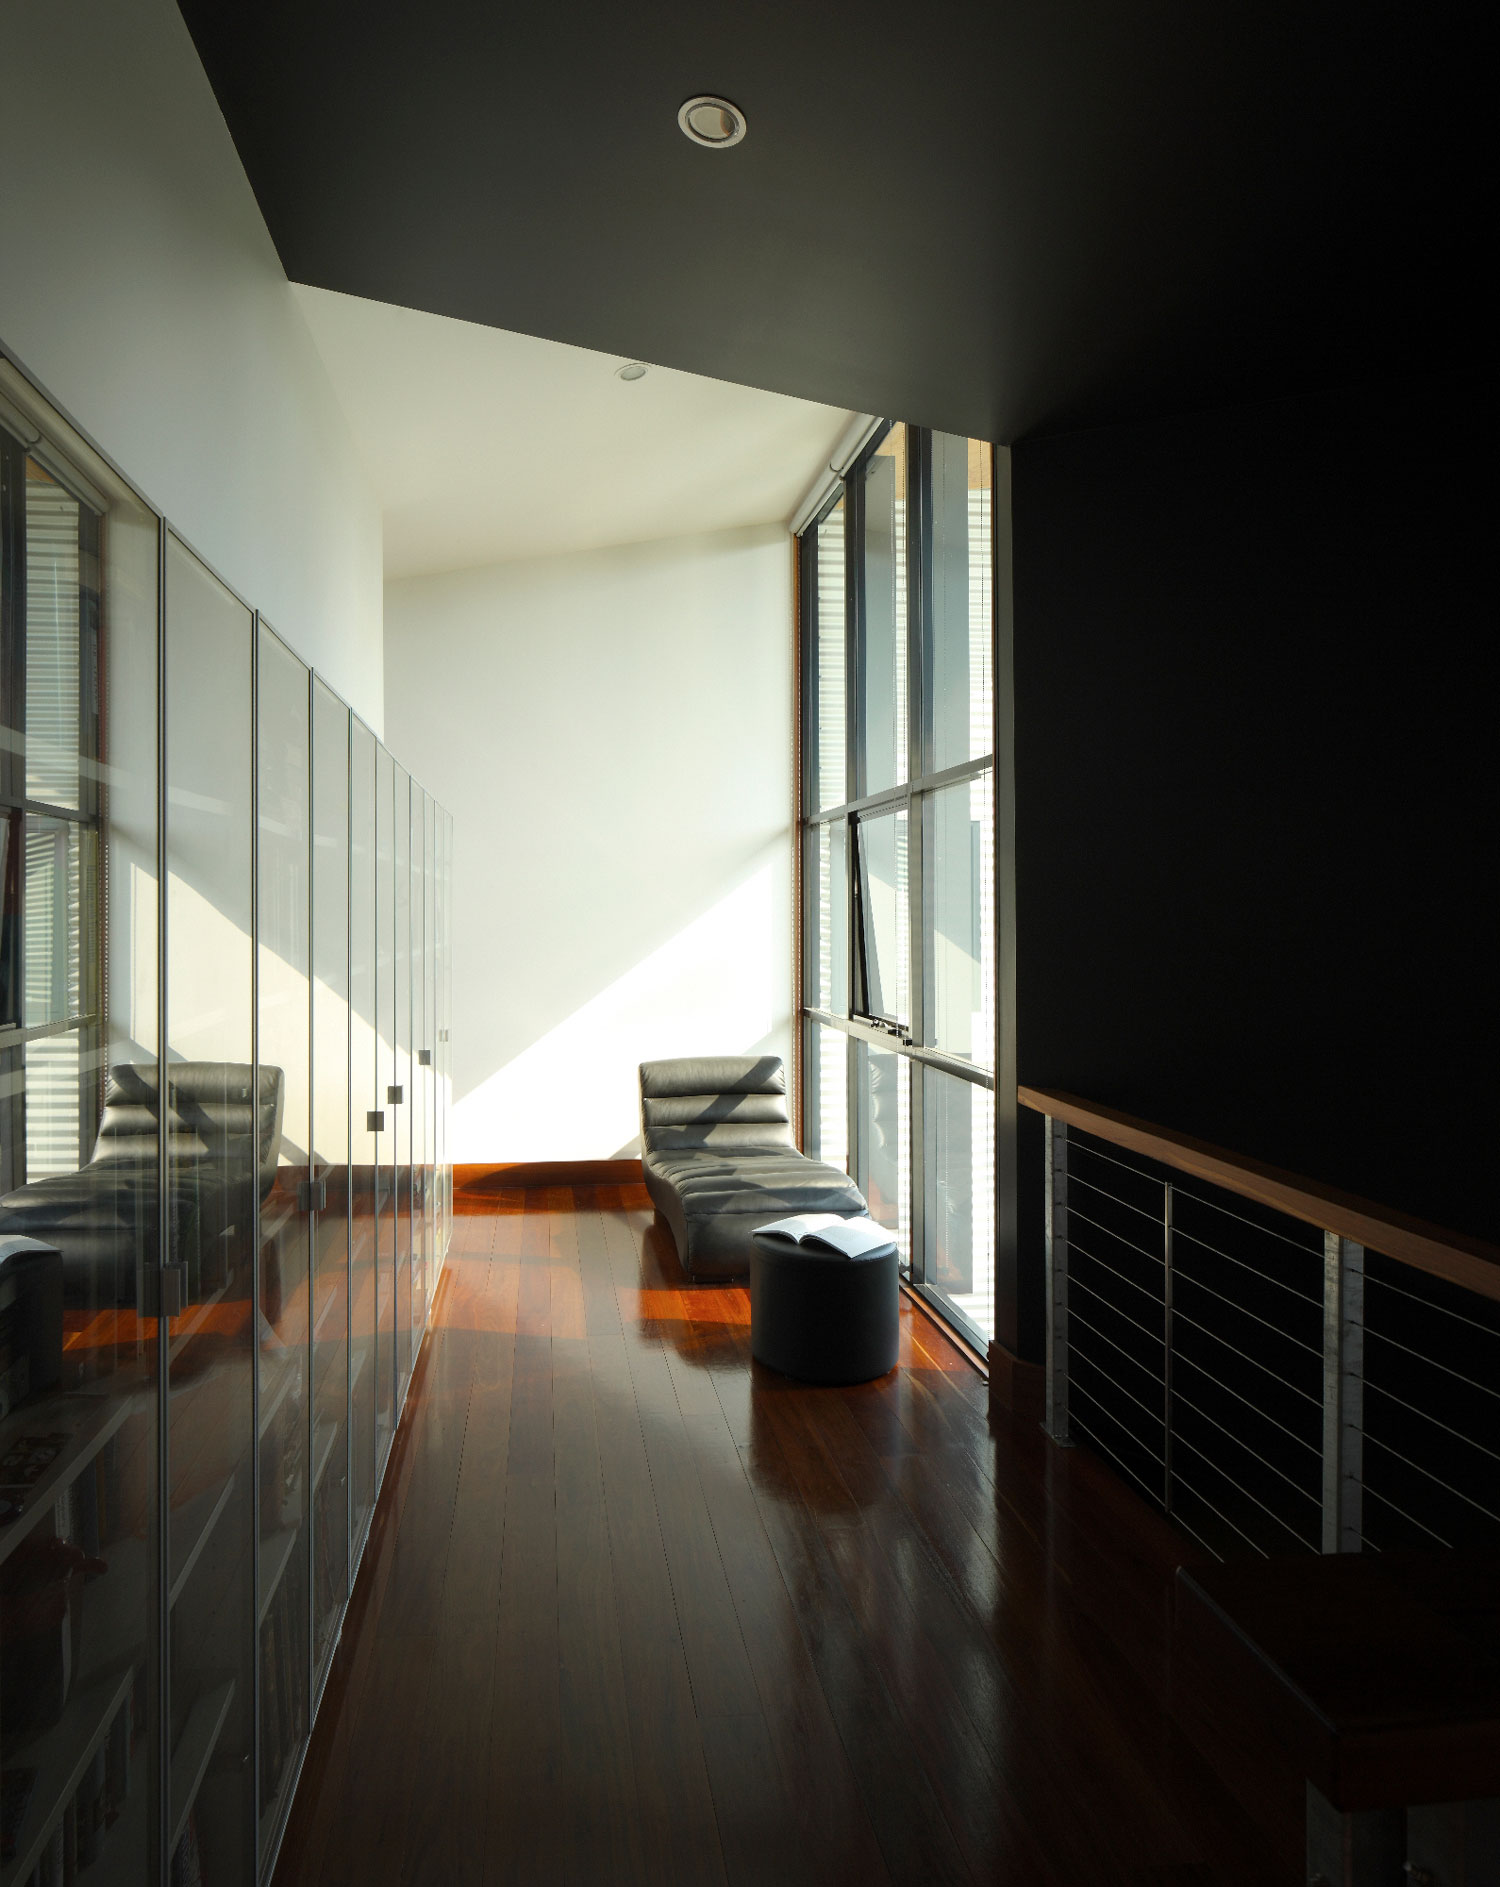 The-Gap-Residence-Guymer-Bailey-Architects-09.jpg